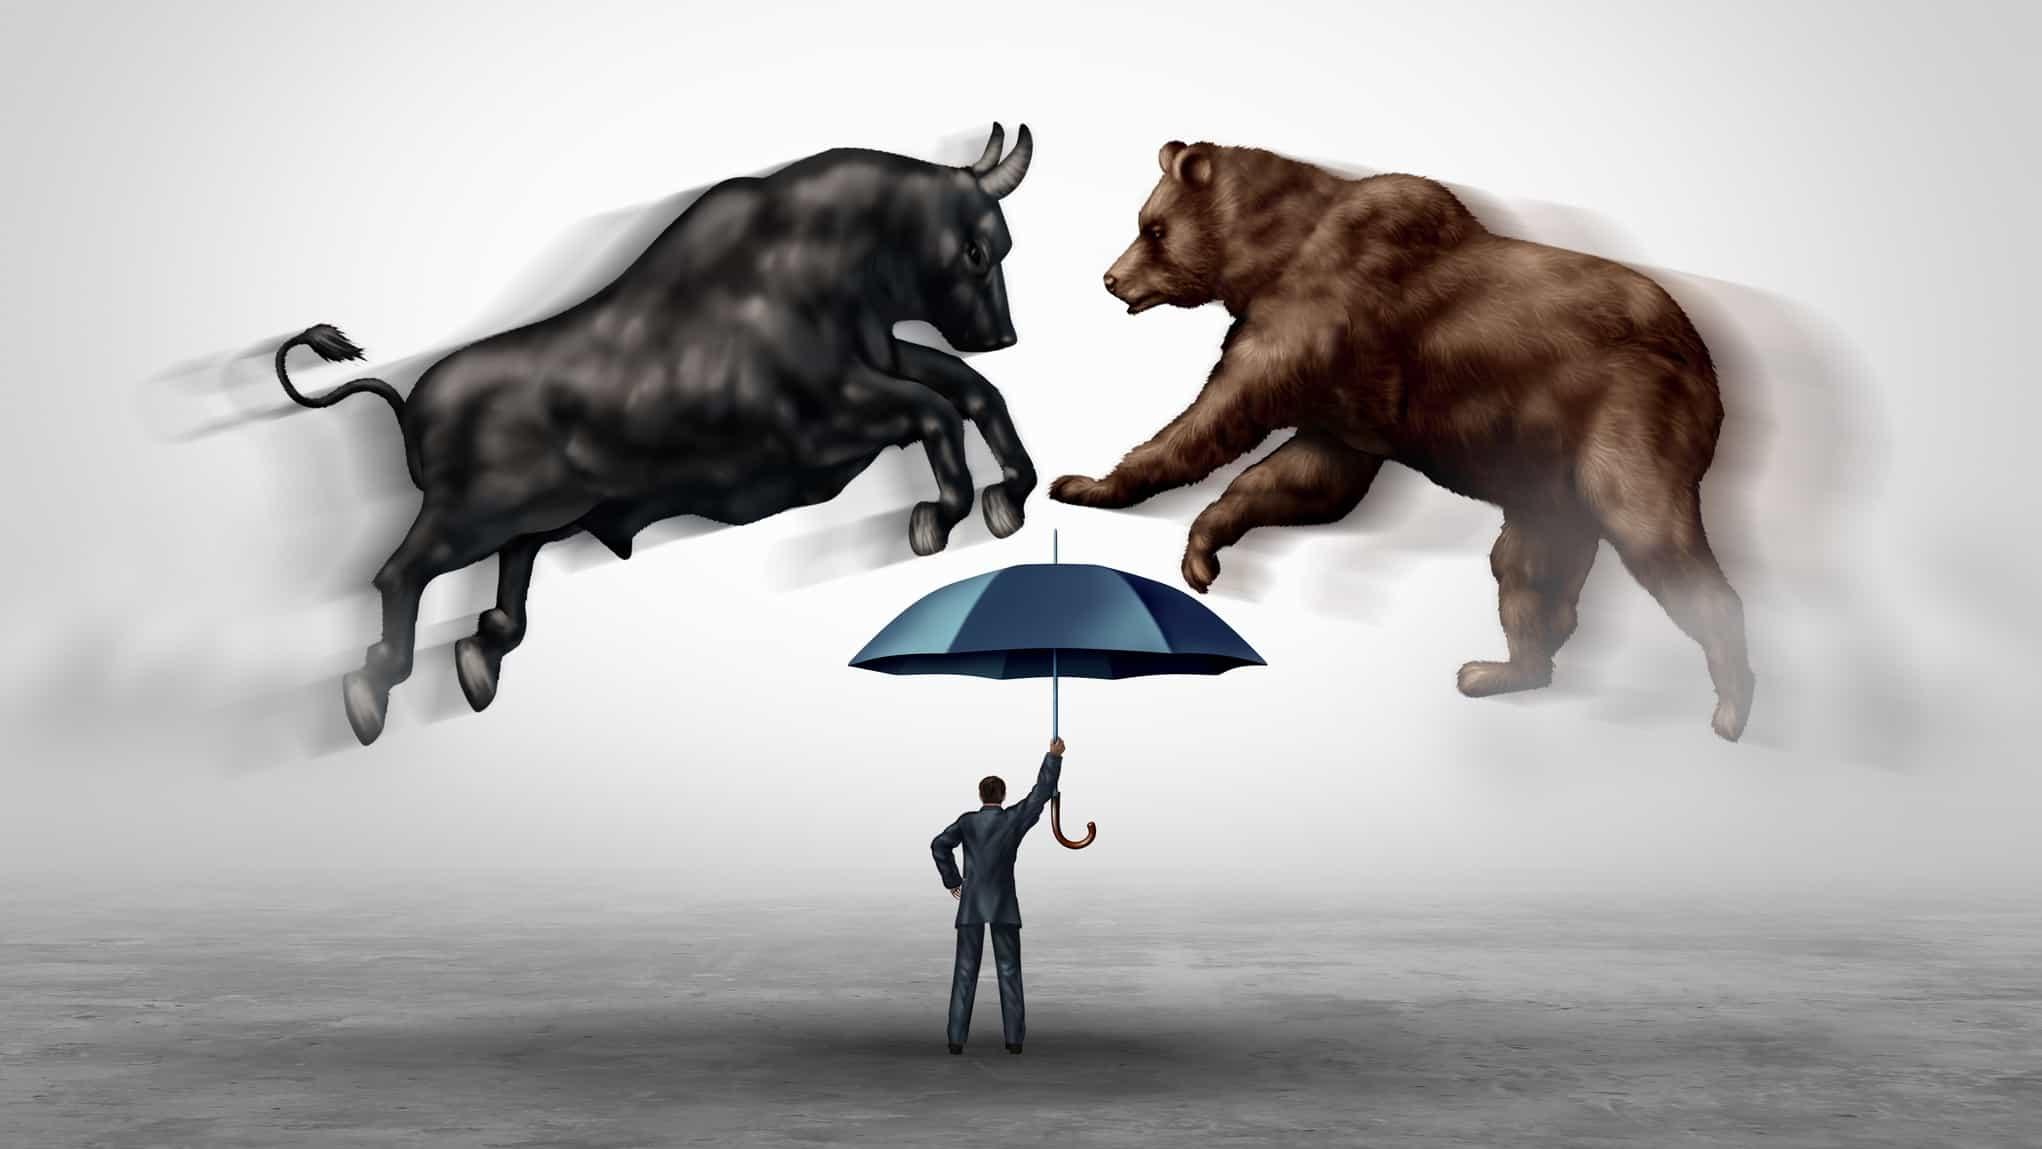 Bulls Make Money, Bears Make Money, and Pigs Get Slaughtered Thumbnail